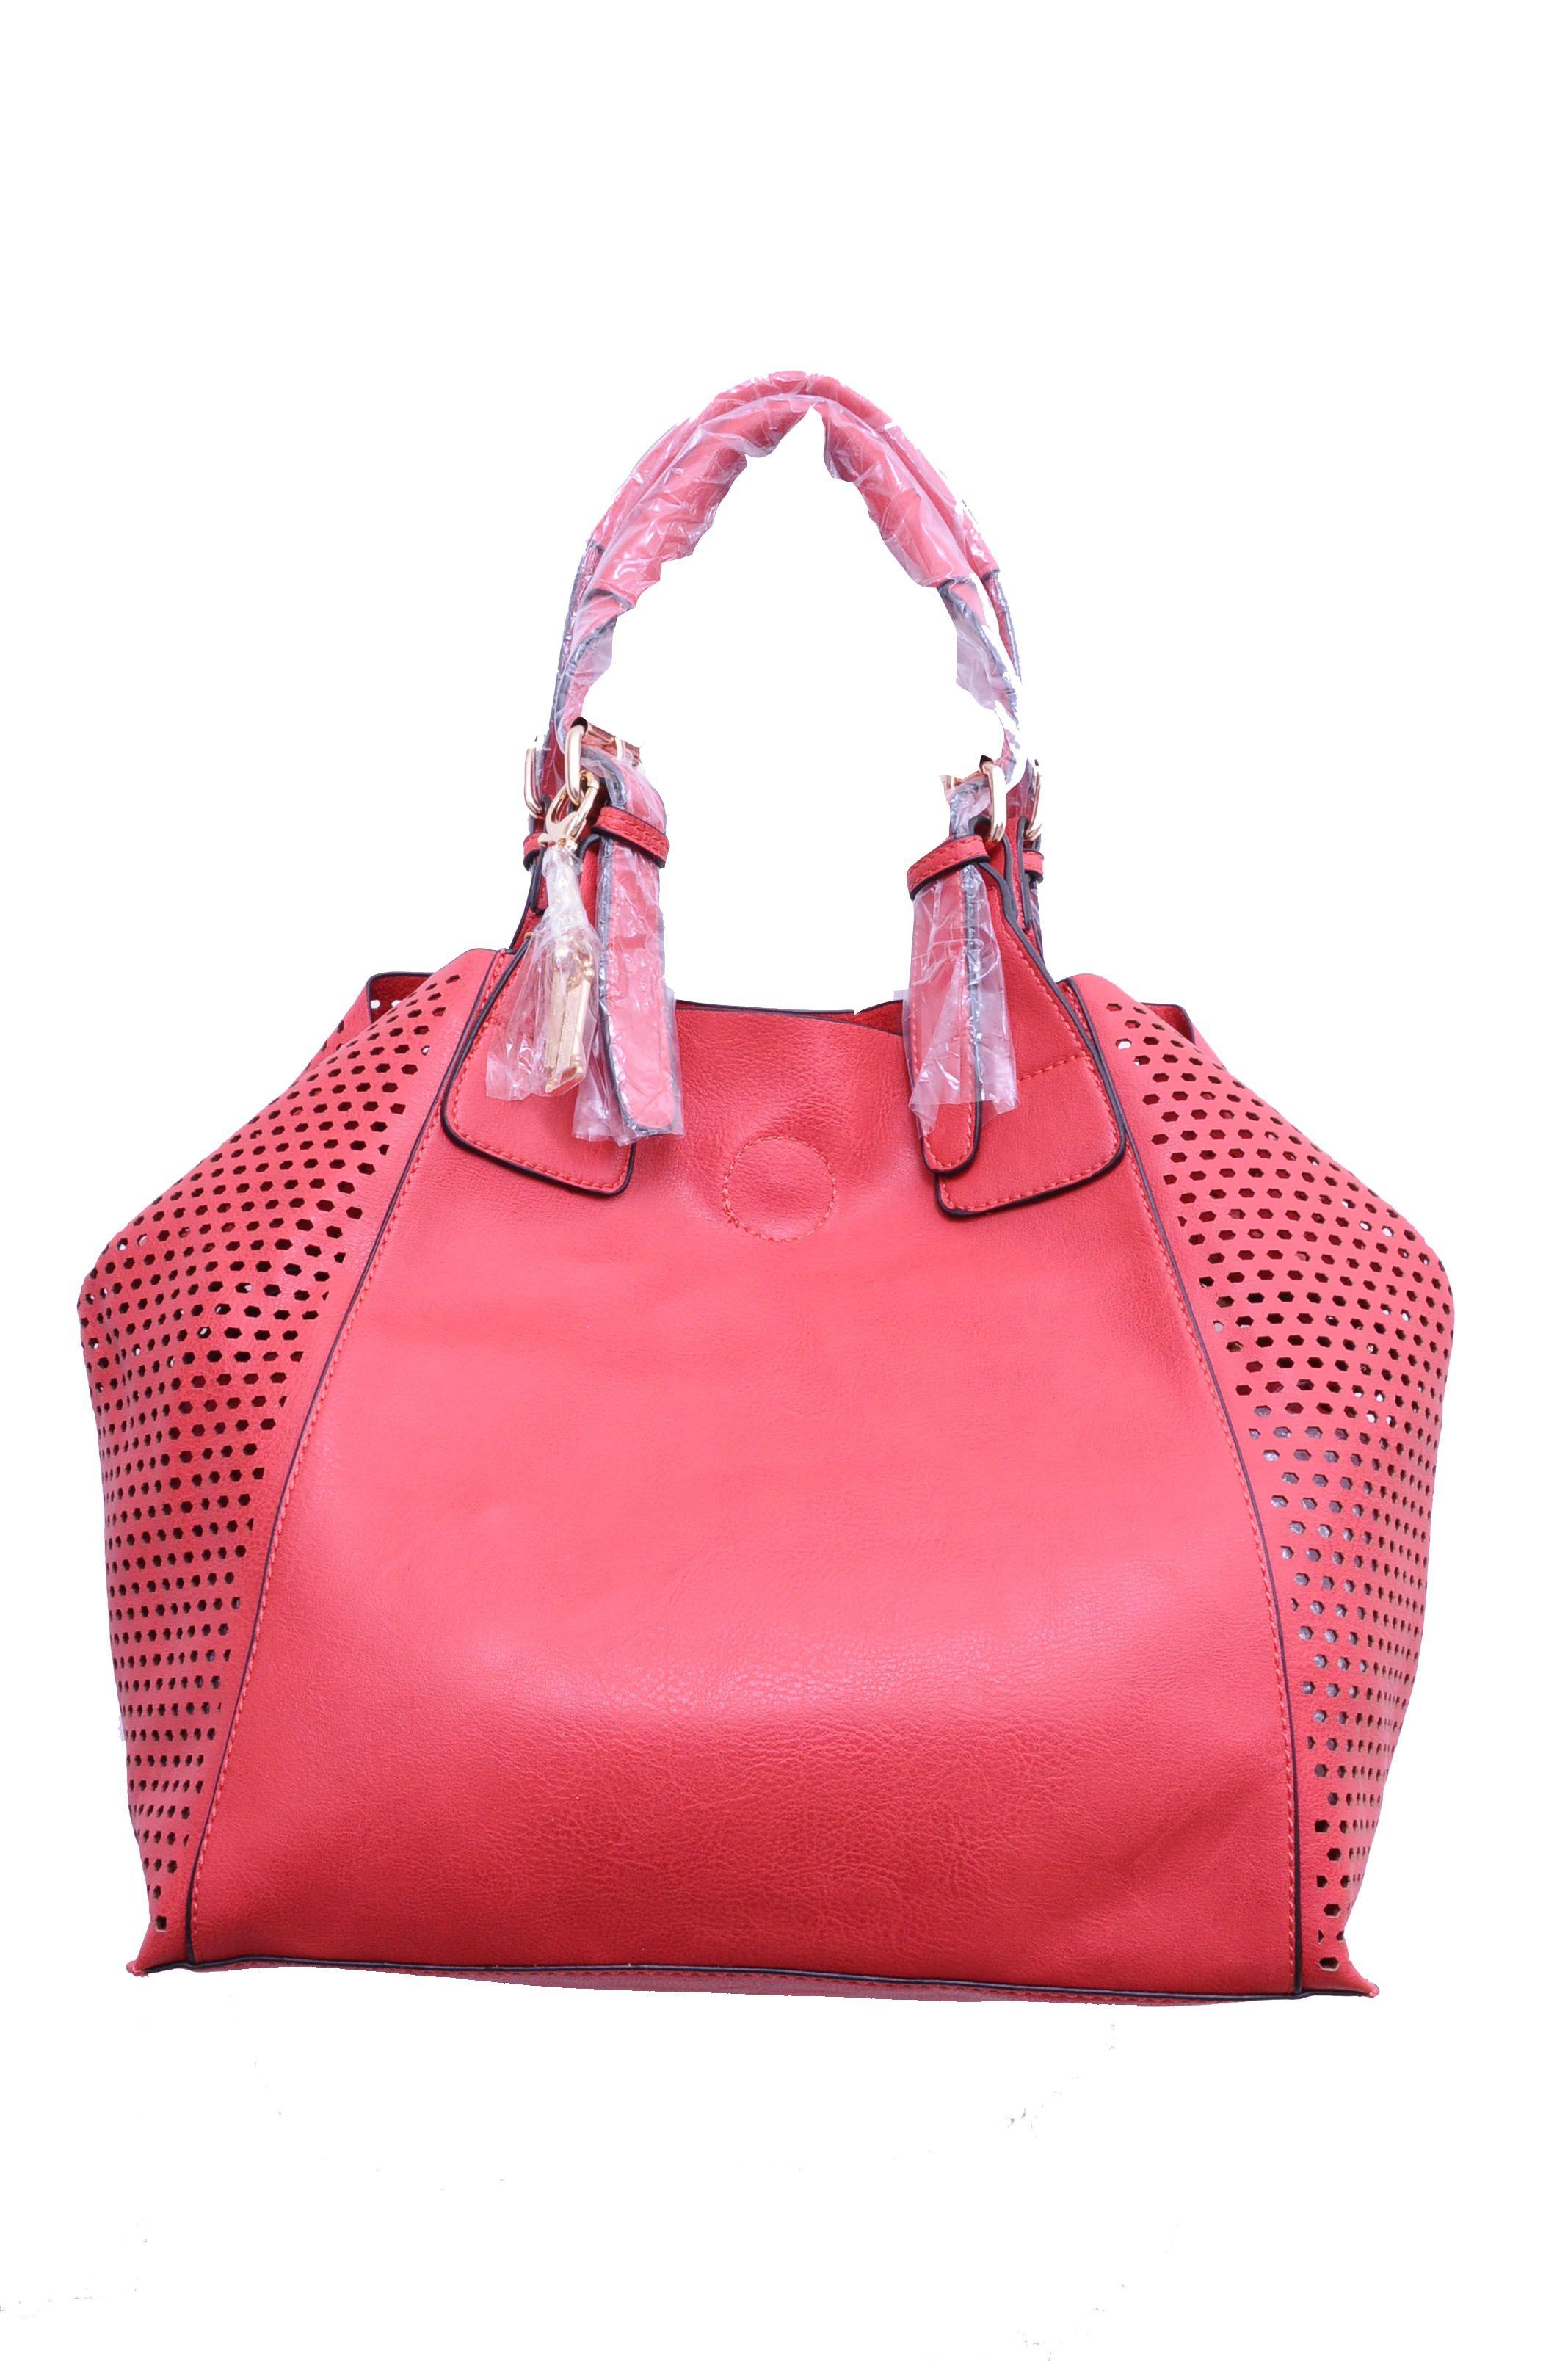 Thais Red Faux Leather Shoulder Bag